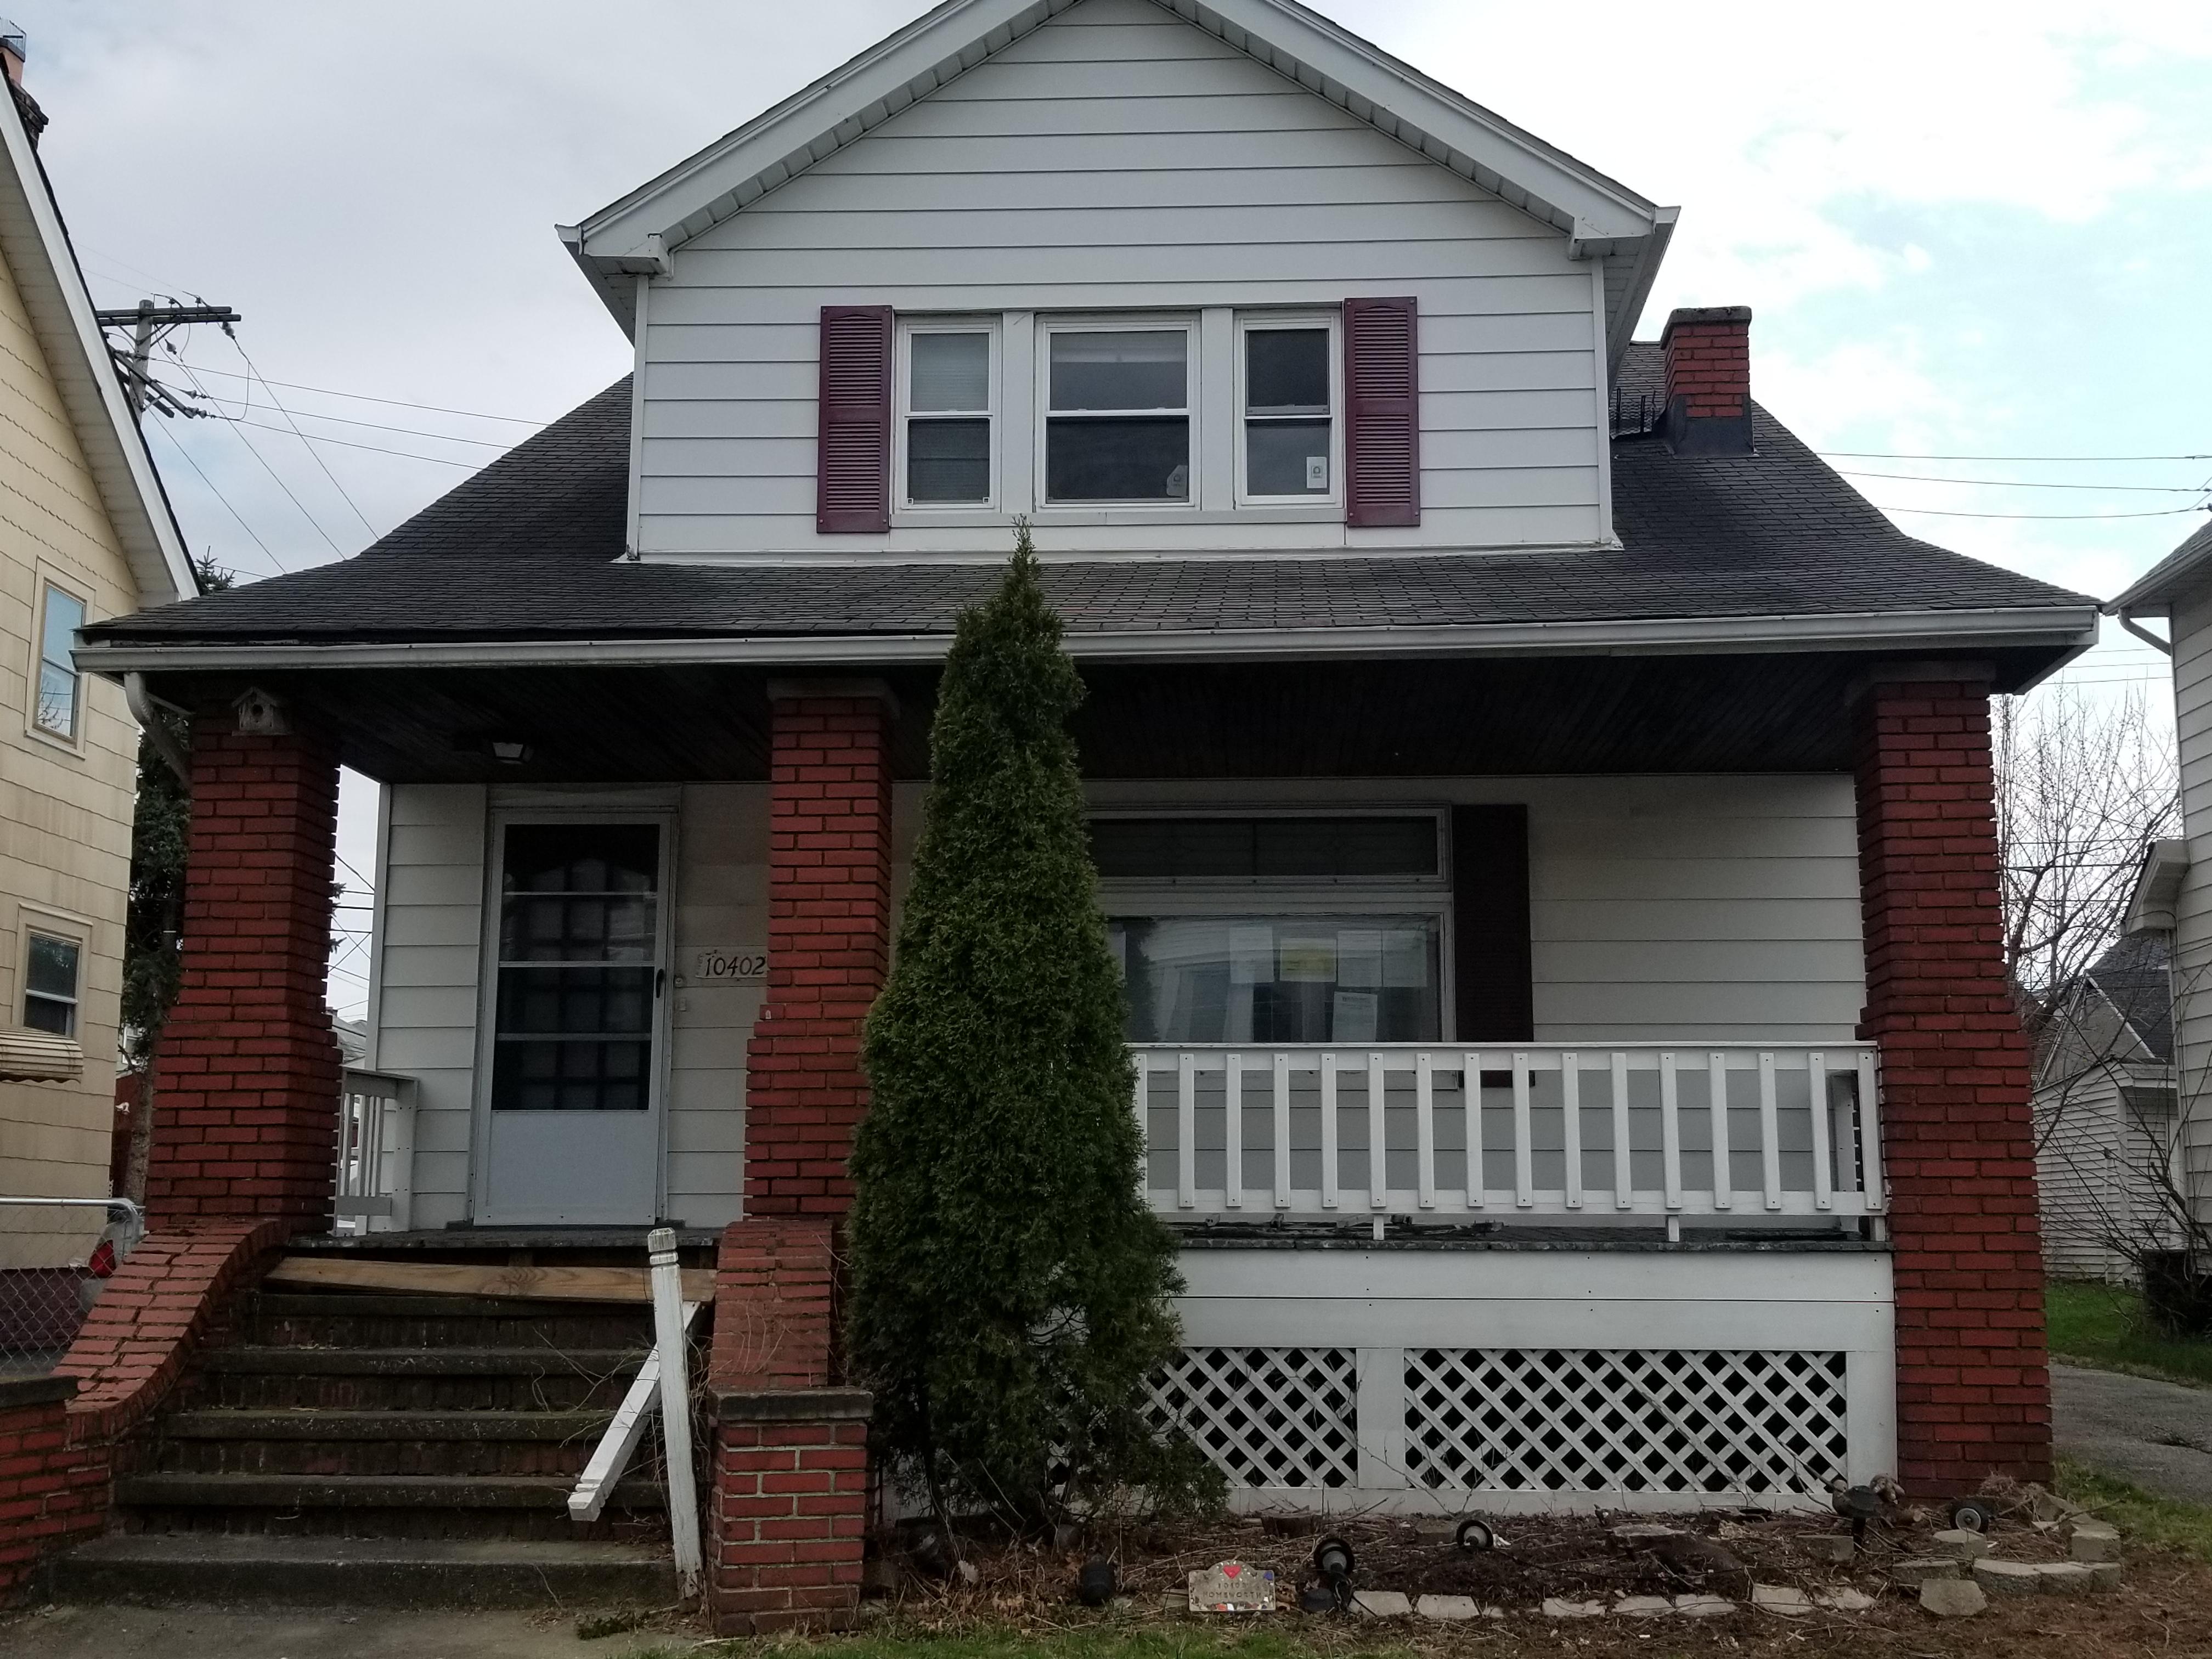 10402 Homeworth Ave, Garfield Heights, OH